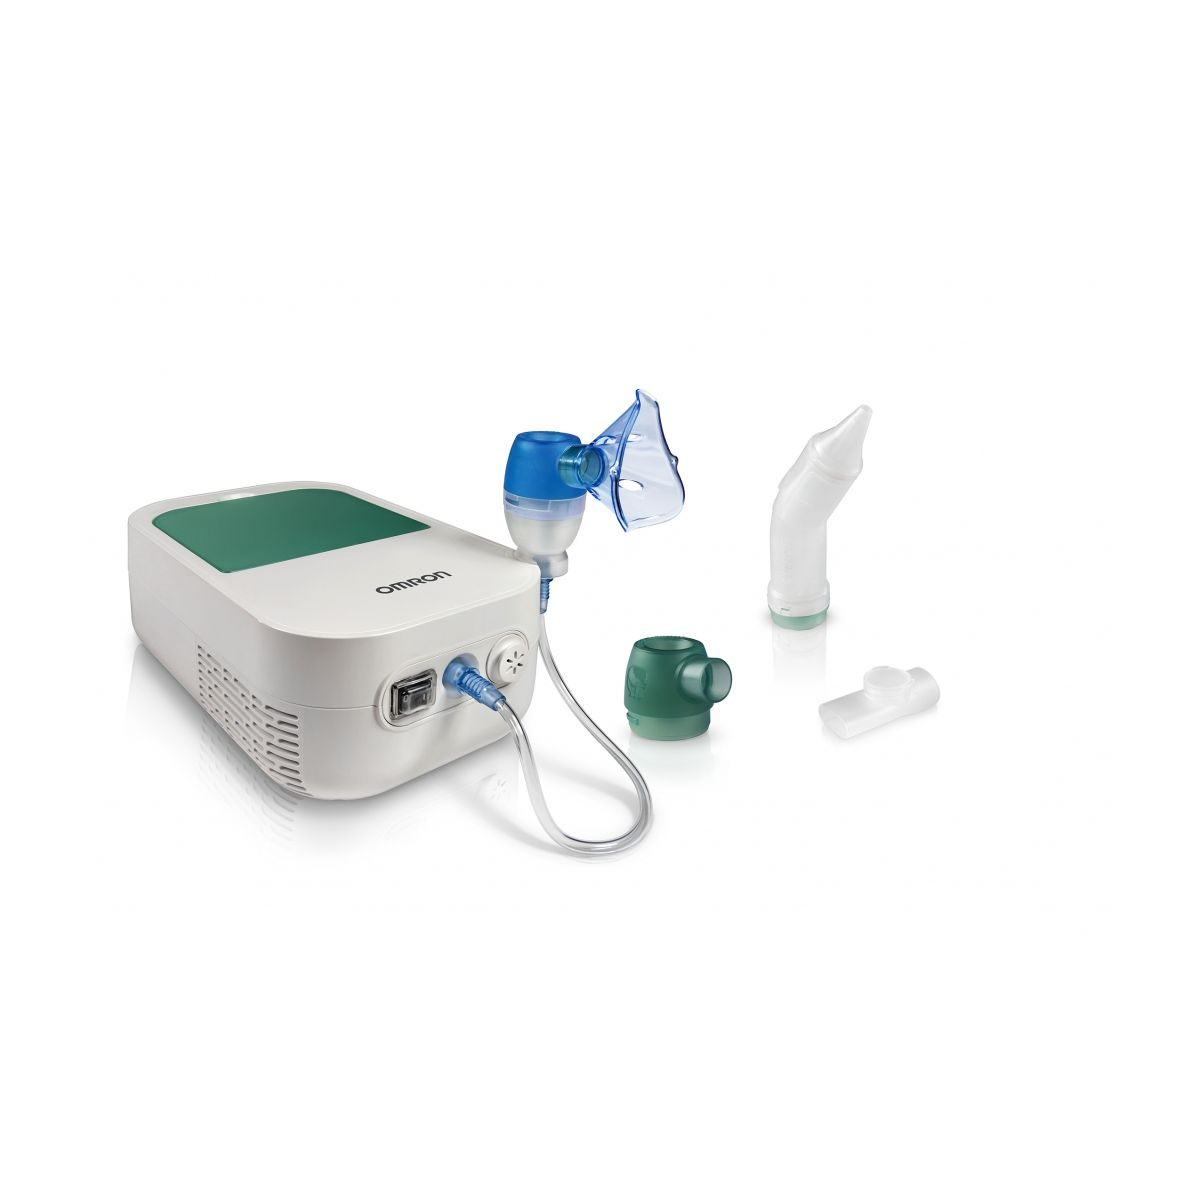 OMRON Duo Baby aspirateur nasal nébulis